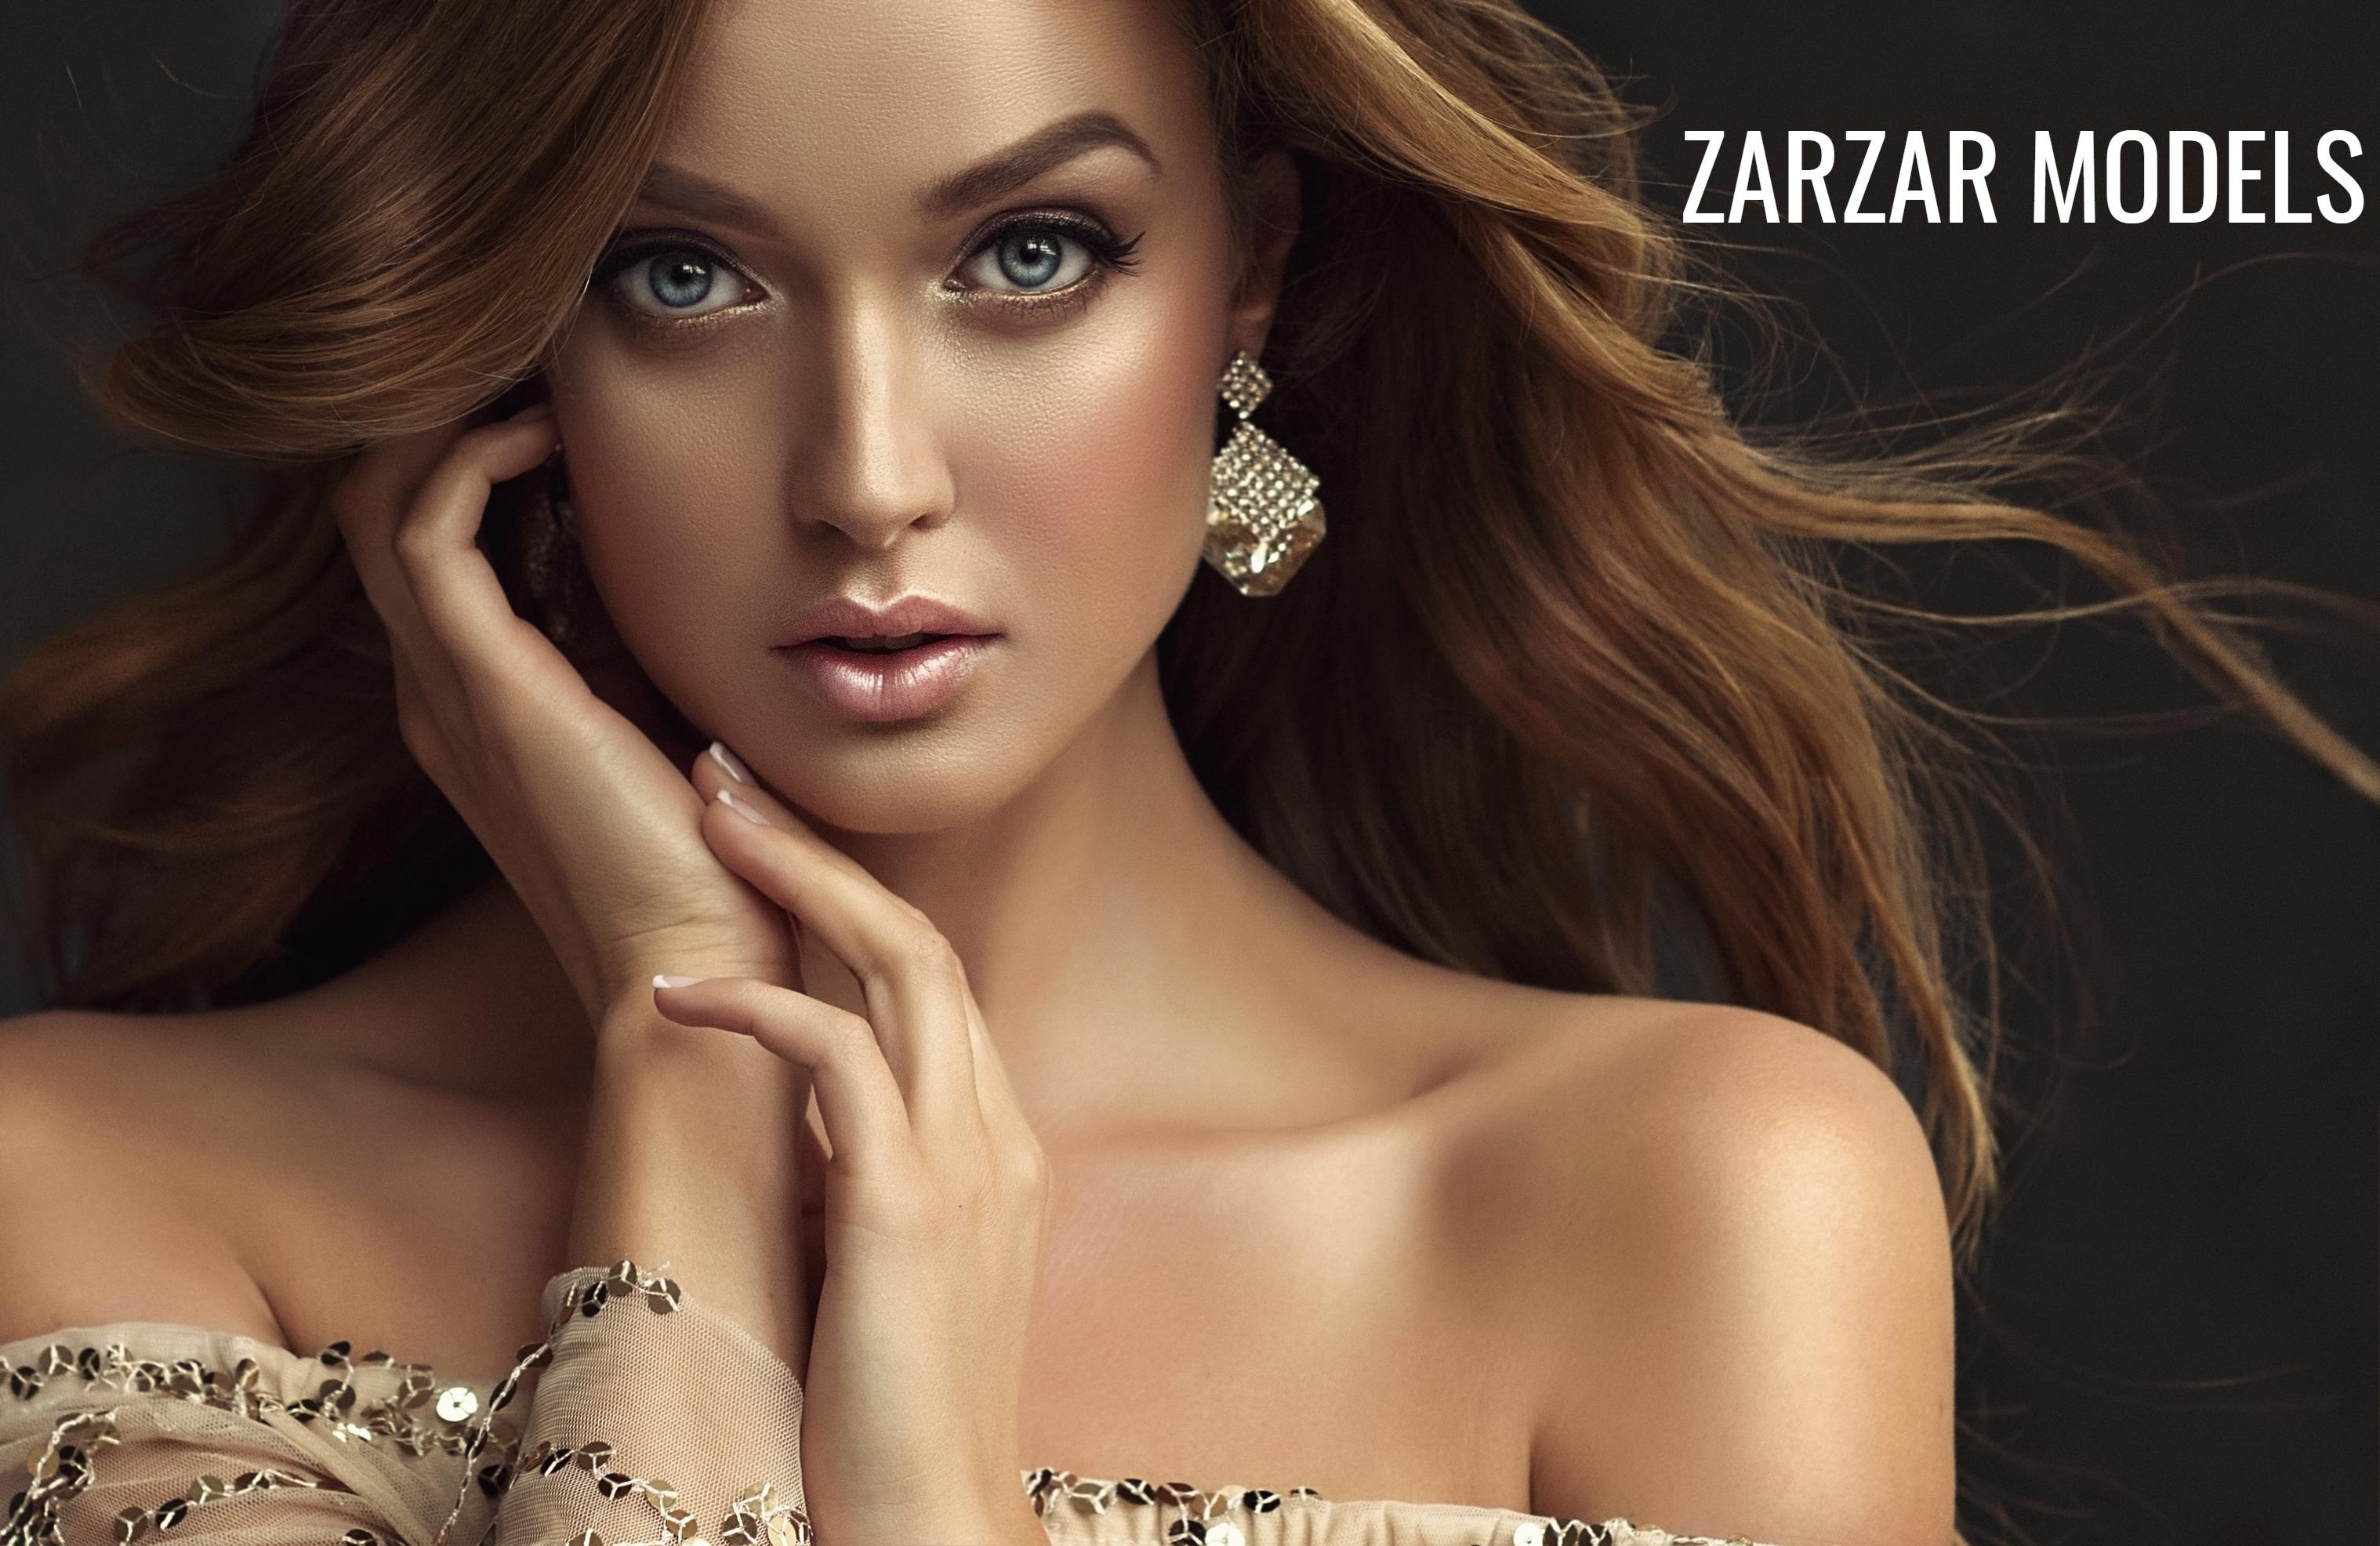 ZARZAR MODELS | Top Modeling Agency For Women, Teens, & Teenagers (Teenage Girls). ZARZAR MODELS | Los Angeles | New York | San Diego | Las Vegas | Miami | Phoenix | San Francisco | London | Paris | Milan | Sao Paulo | Tokyo.